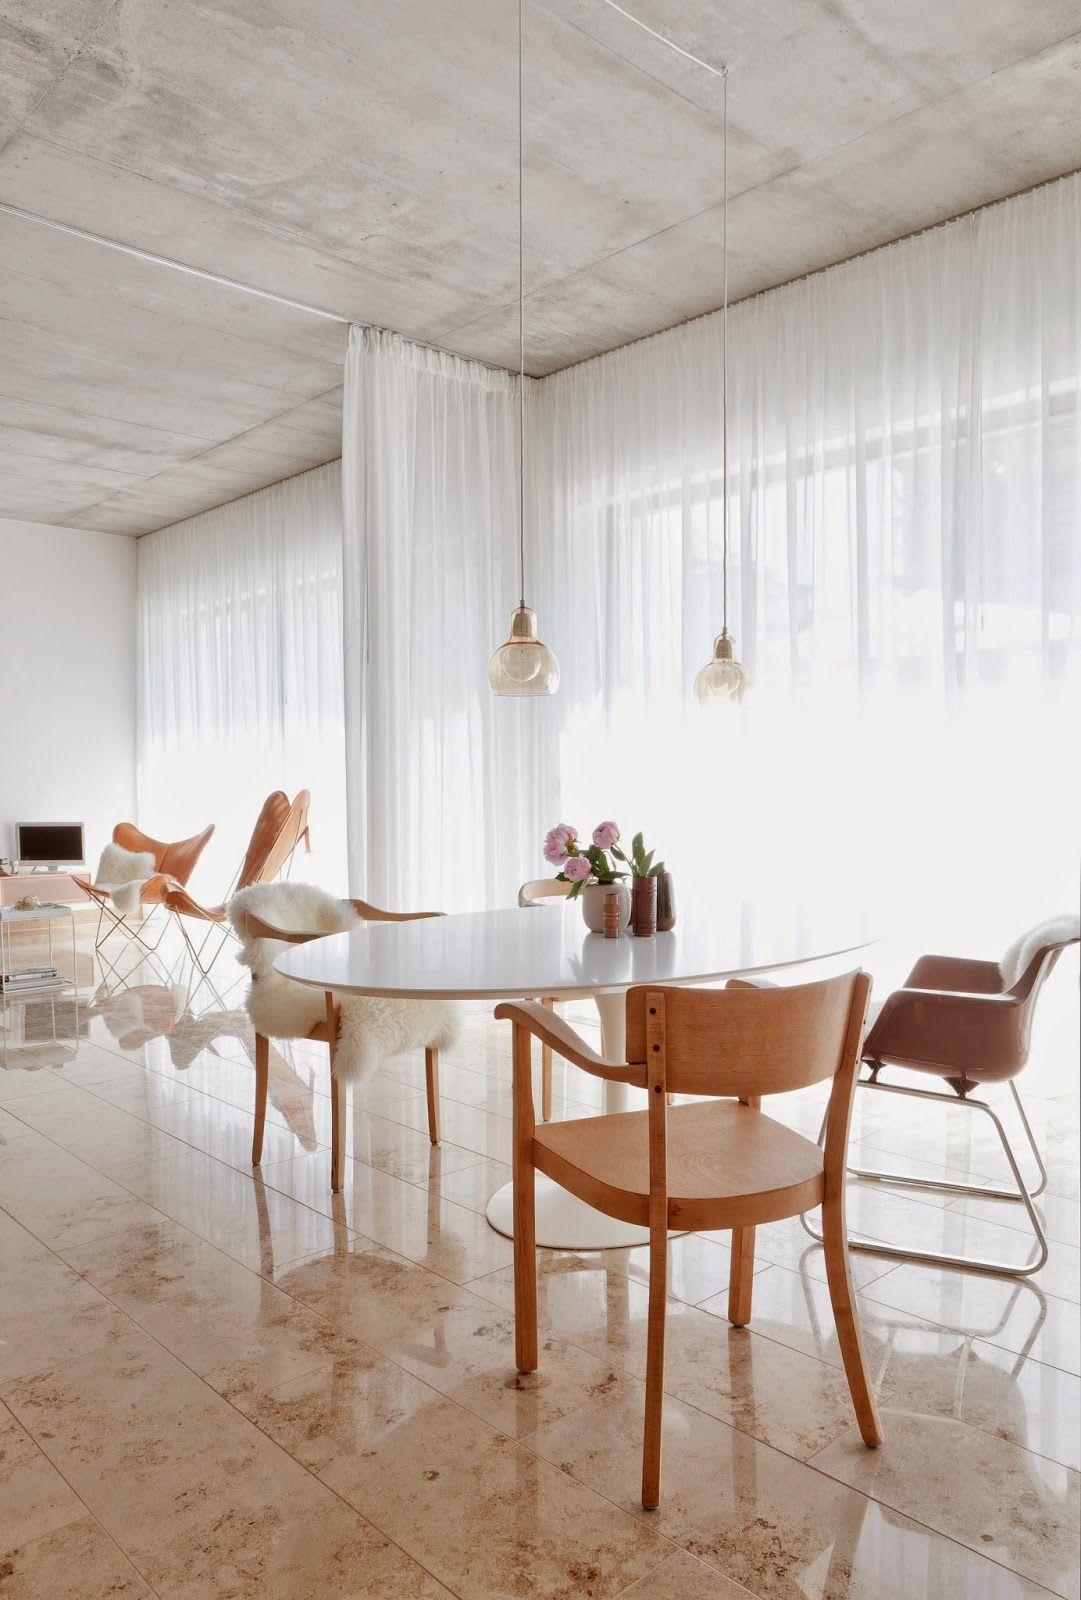 Home interior design dining room a unique and fabulous german home  interior  pinterest  home